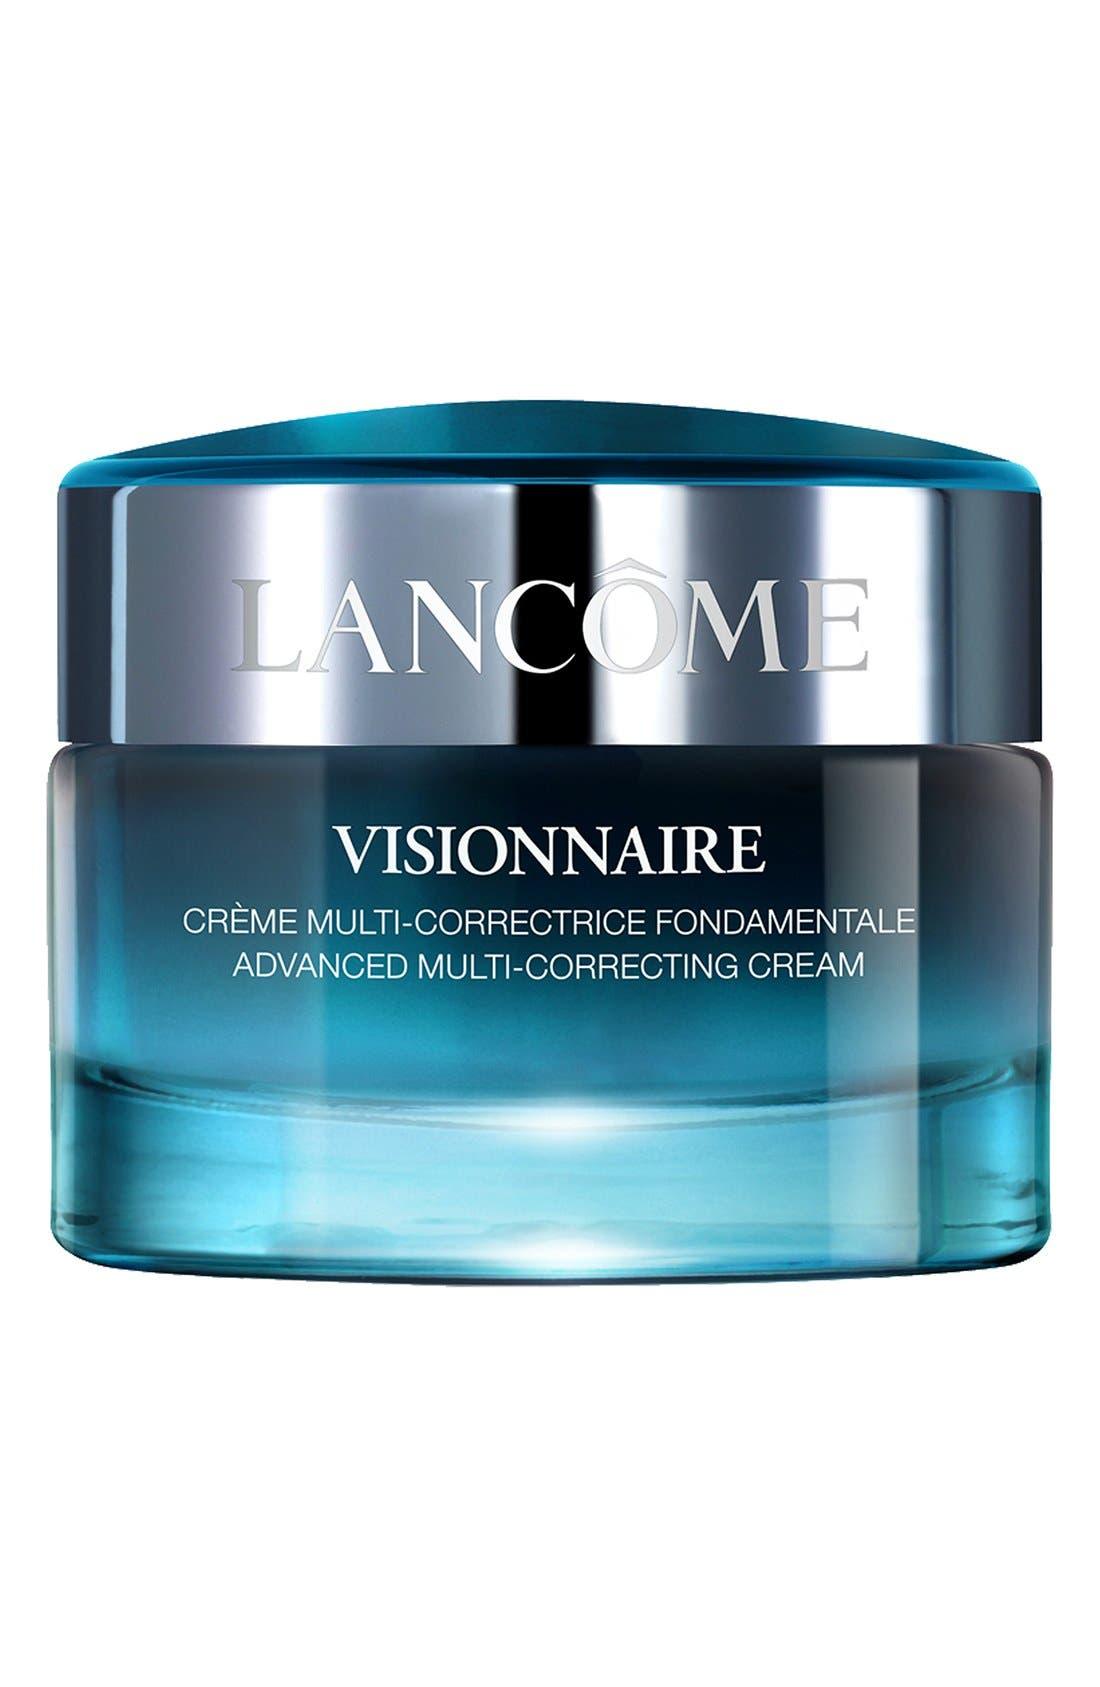 Lancôme Visionnaire Advanced Multi-Correcting Moisturizer Cream